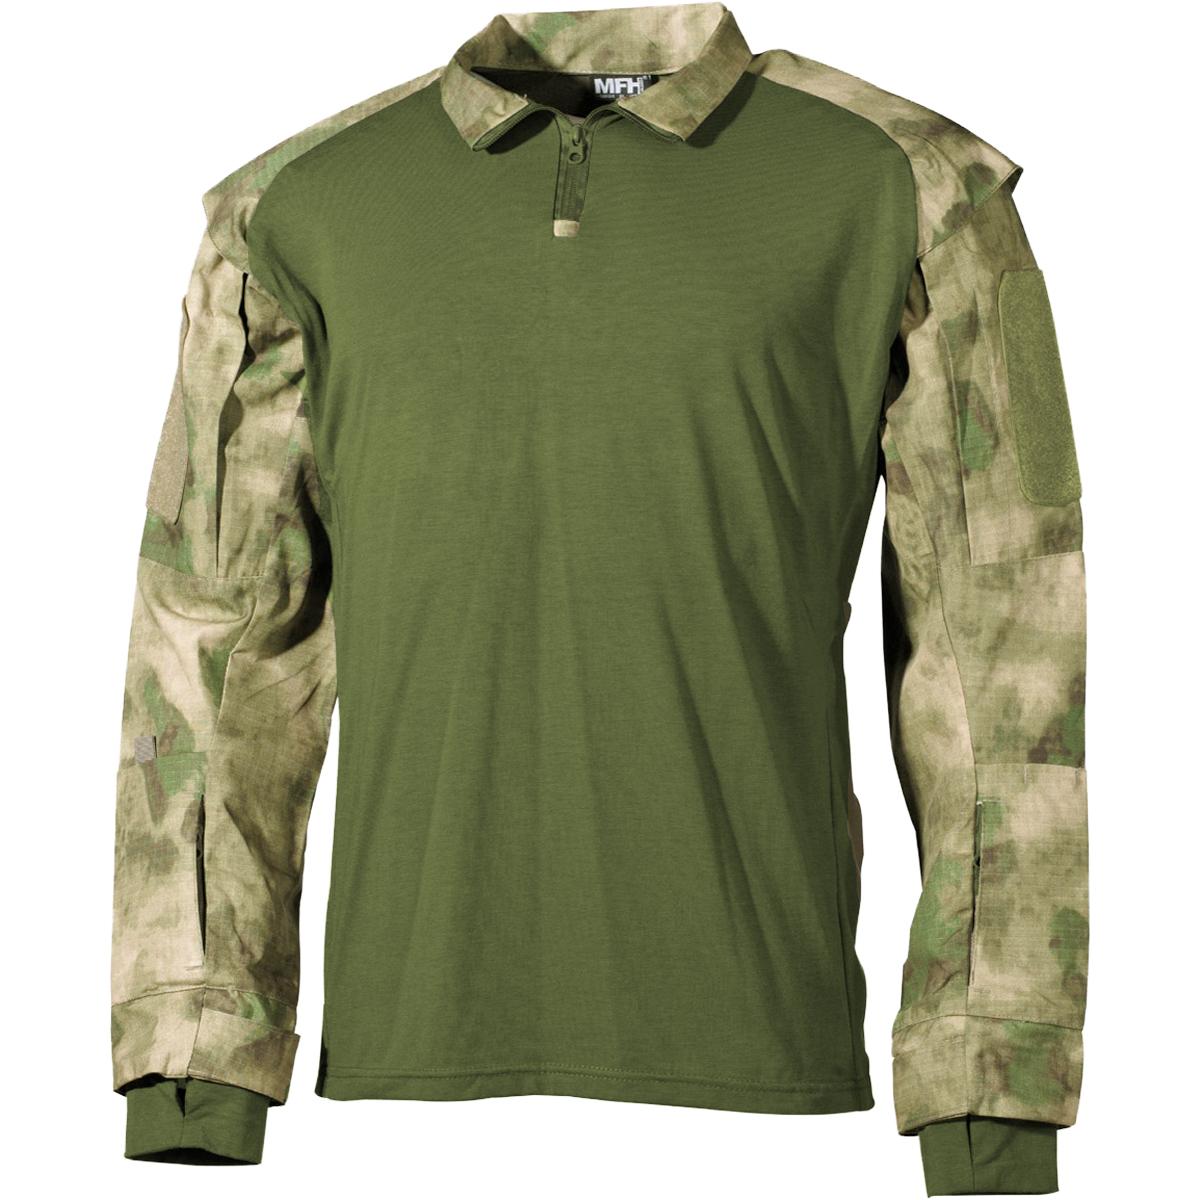 MFM-US-Camisa-Tactica-Hombres-Senderismo-Aire-Libre-Pesca-Caza-HDT-Camo-FG